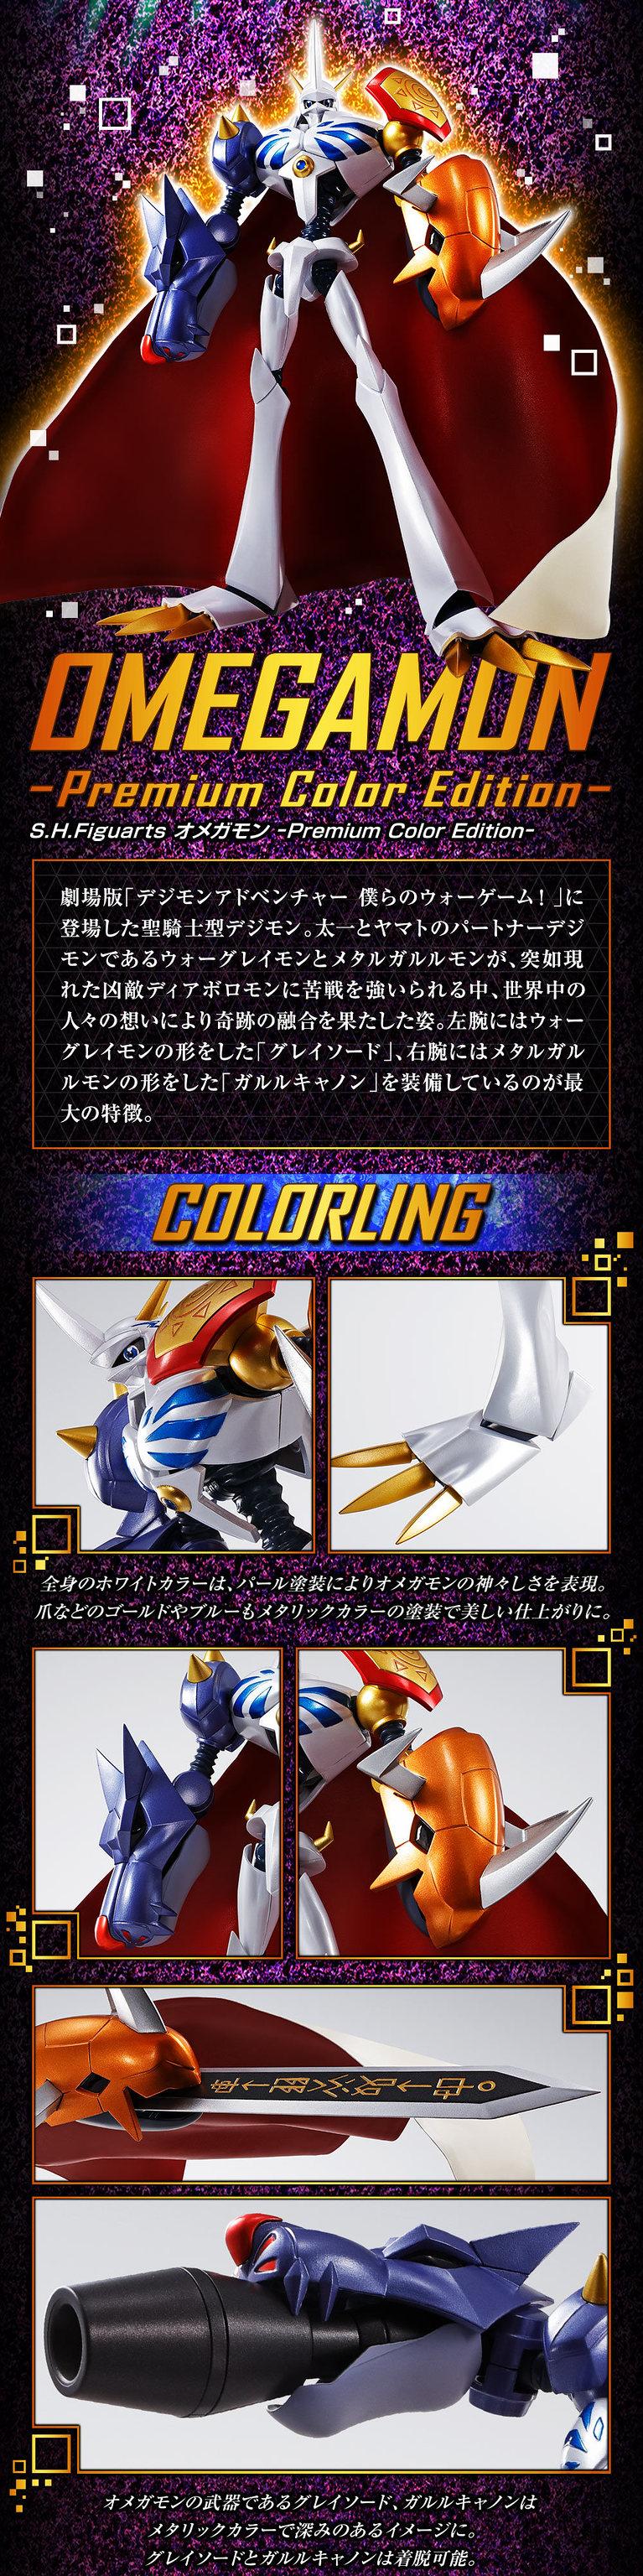 S.H.Figuarts 奧米加獸 -Premium Color Edition- 預計 09 月 04 日於魂商店開放預購!